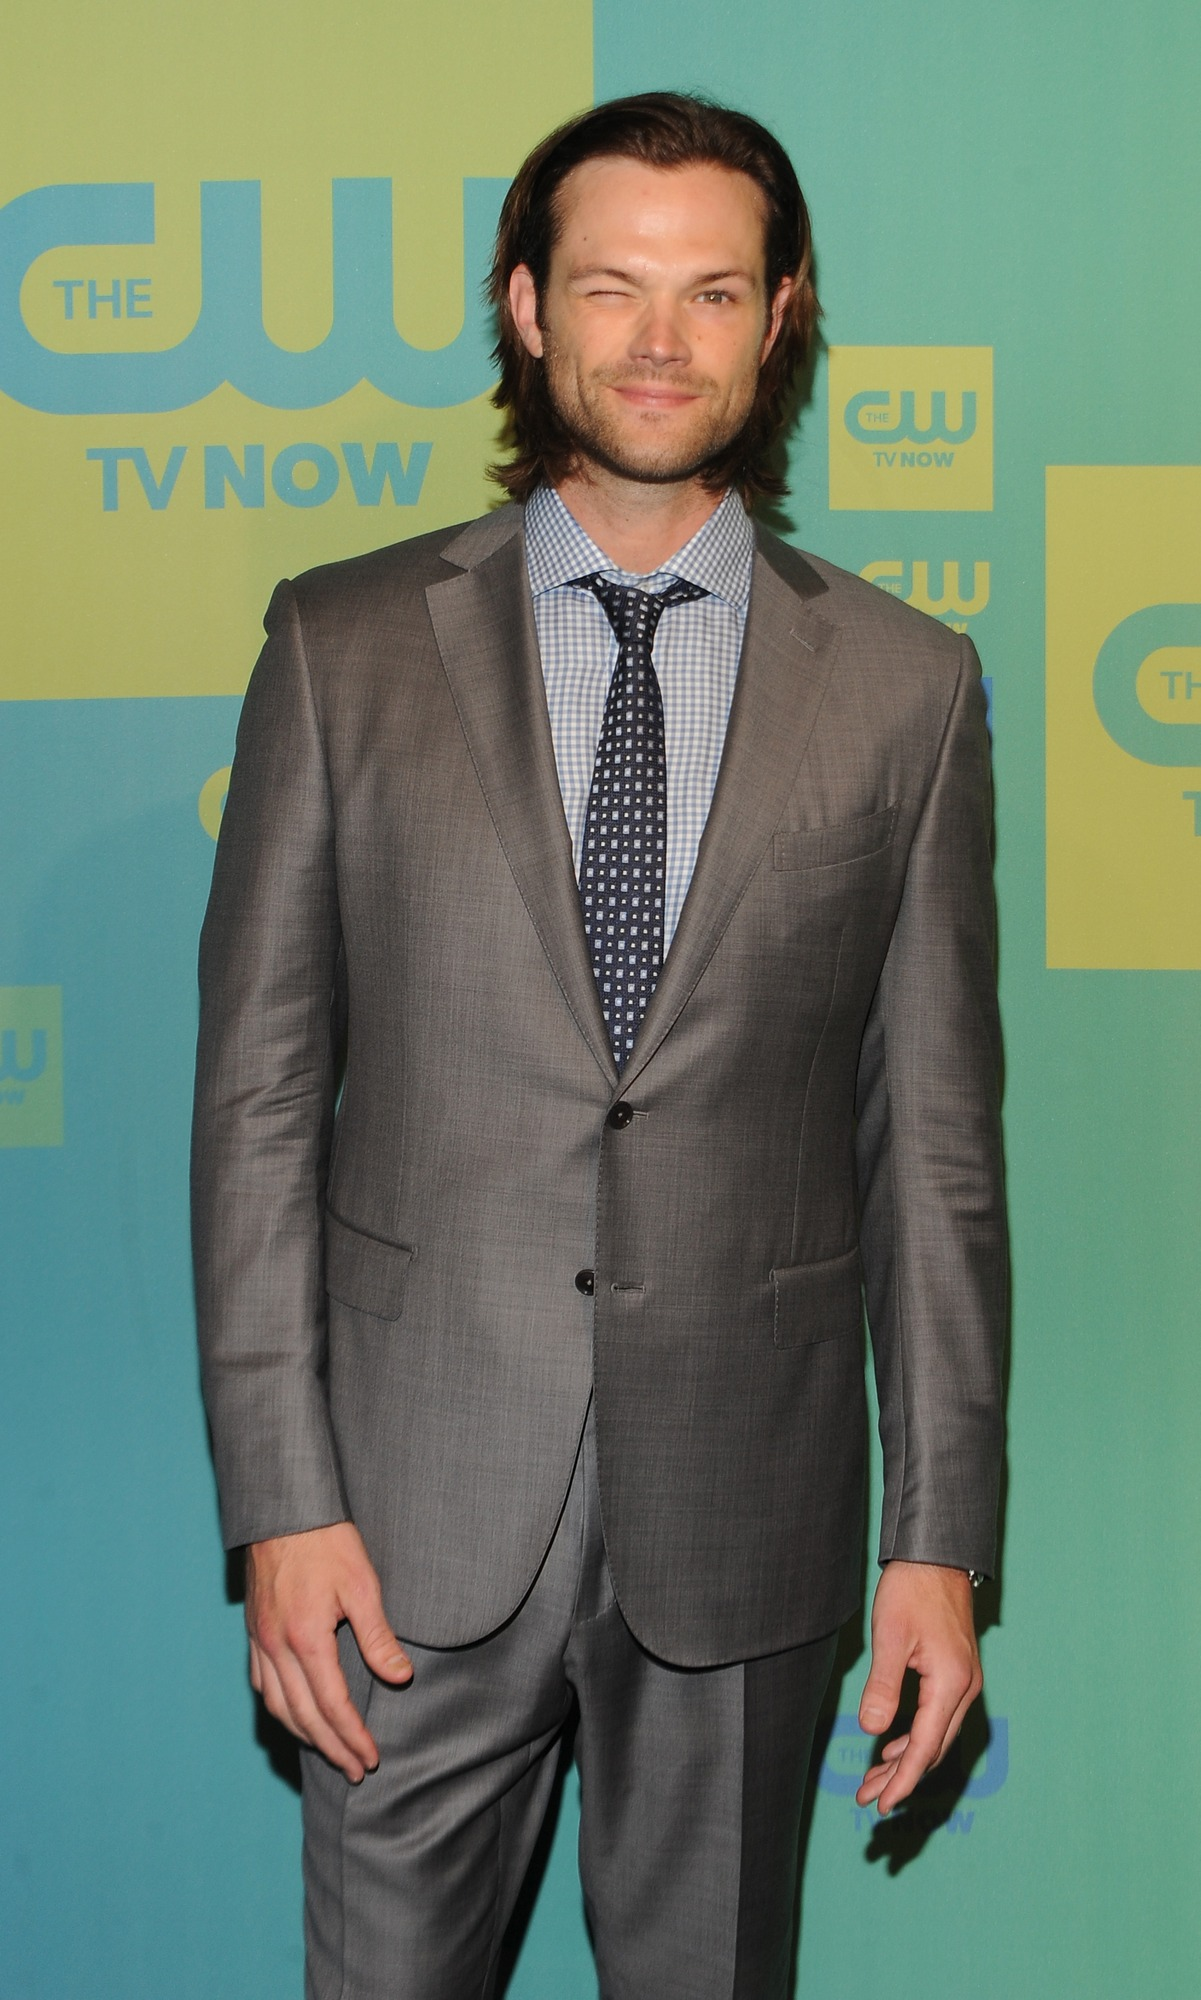 CW Upfronts 2014 - Jared Padalecki Photo (37084045) - Fanpop